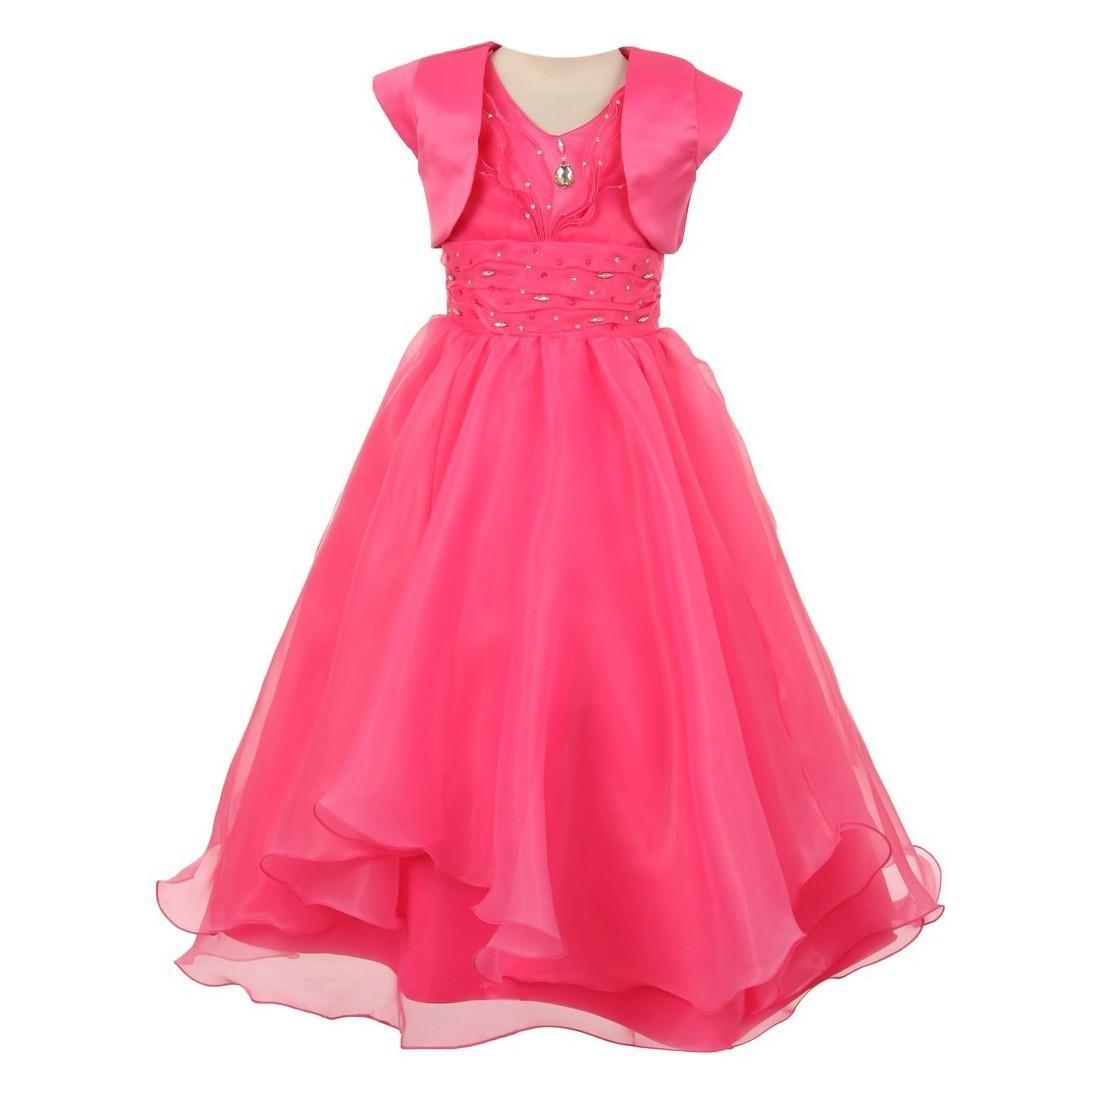 Chic Baby Big Girls Fuchsia Ruffle Satin Bolero Junior Bridesmaid Dress 12